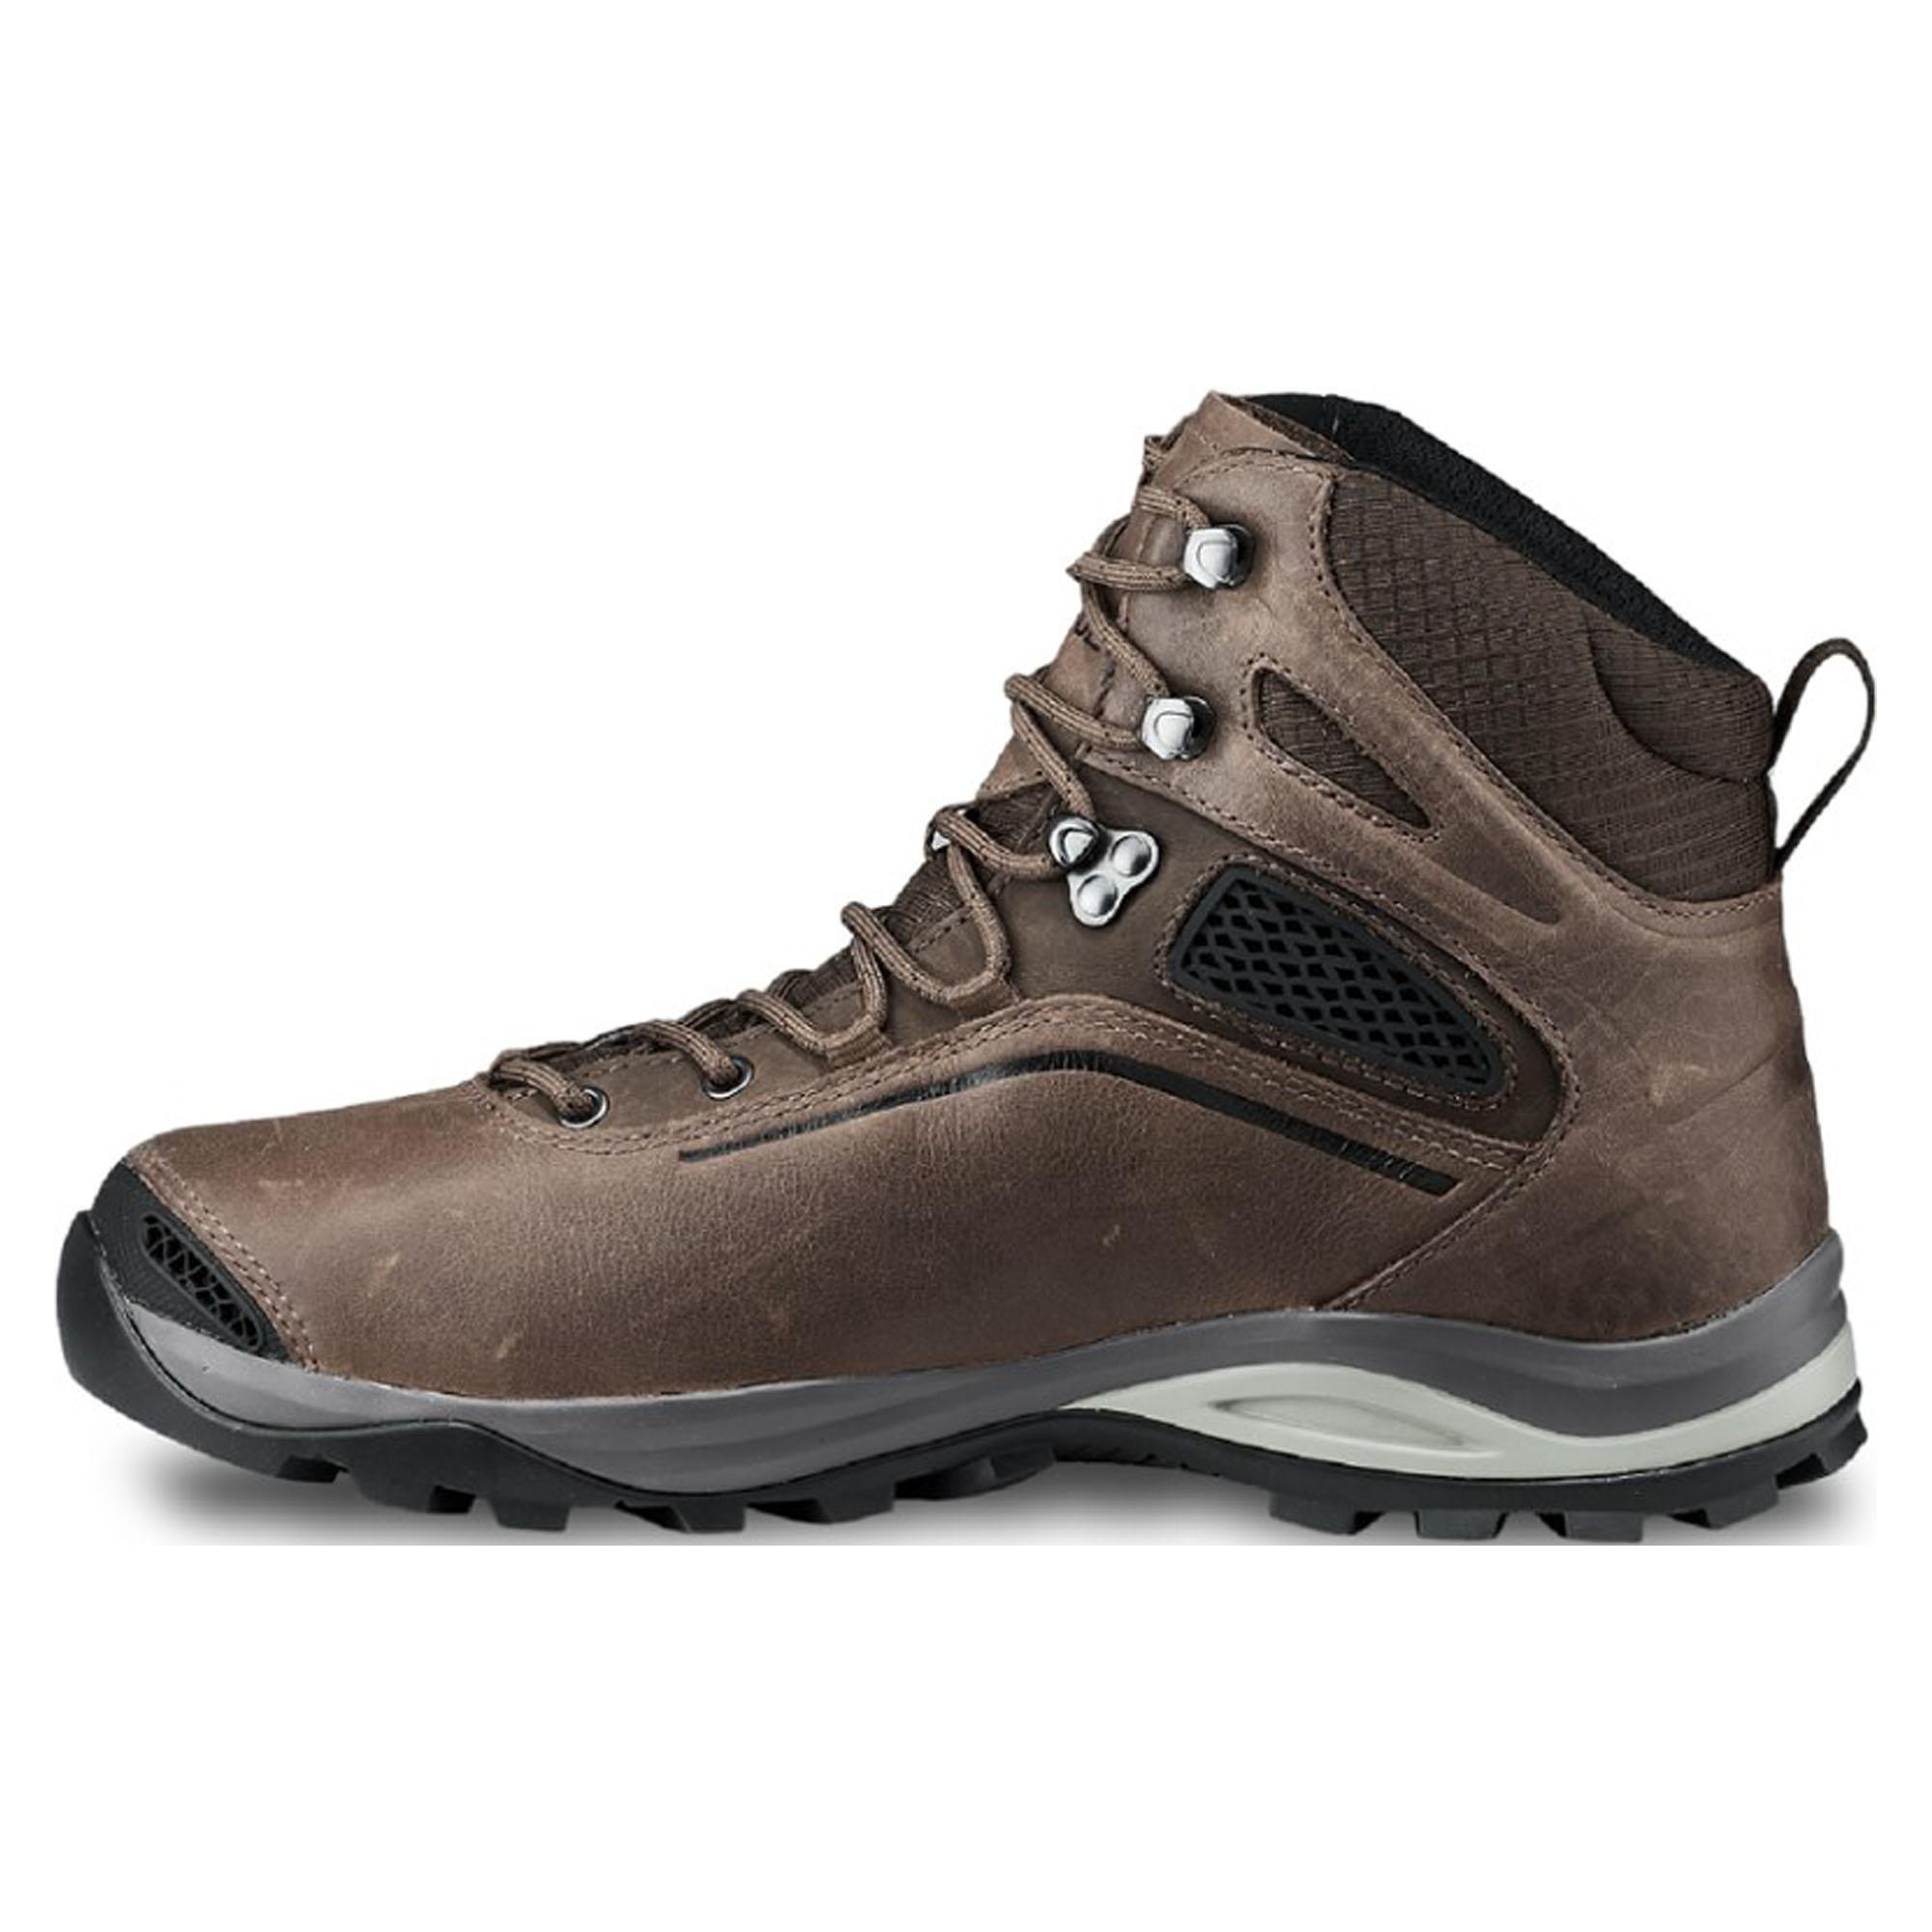 b2762c1439a Vasque Men's Canyonlands Ultradry Hiking Boots